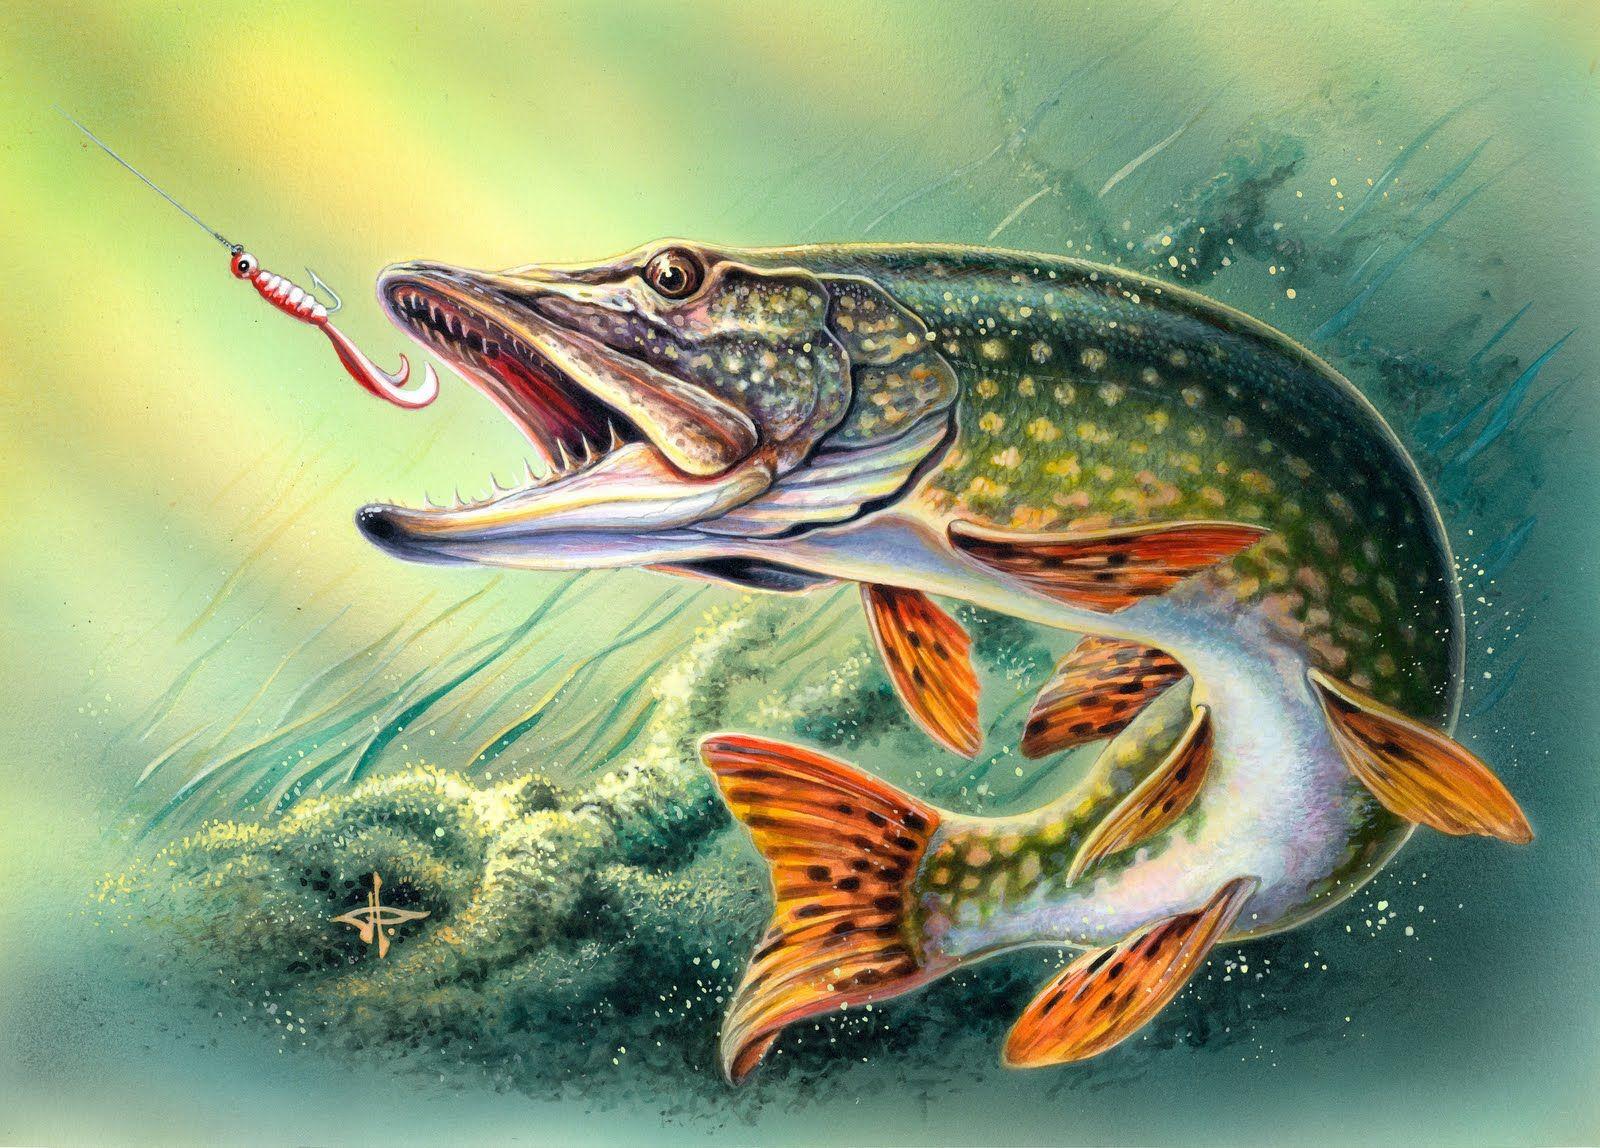 Freshwater fish art - Saltwater Fish Art Pike Fish Pike Is A Species Of Freshwater Fish That Is Native